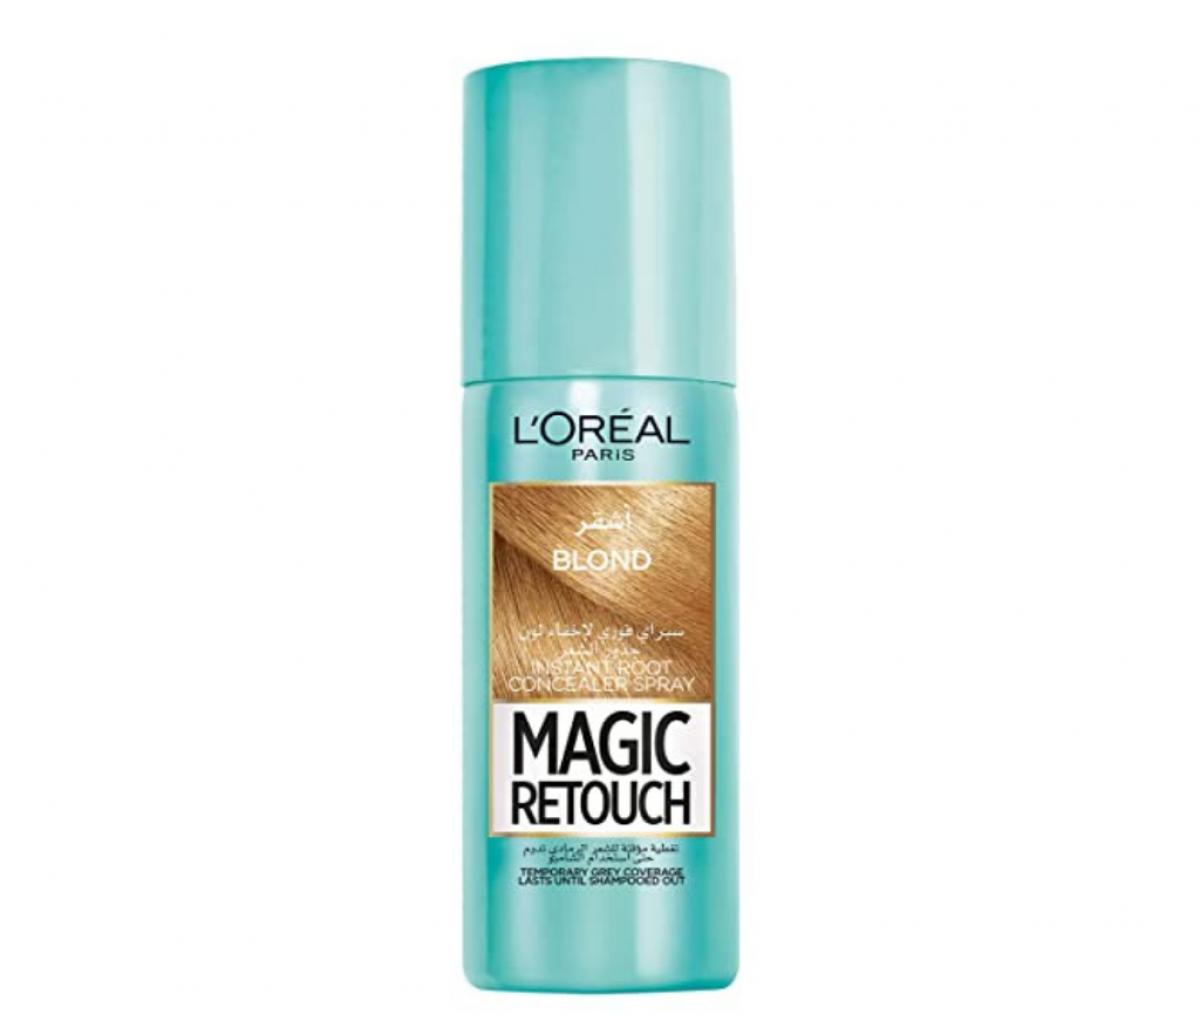 Loreal 75ml Magic Retocuh Blond Hair Spray